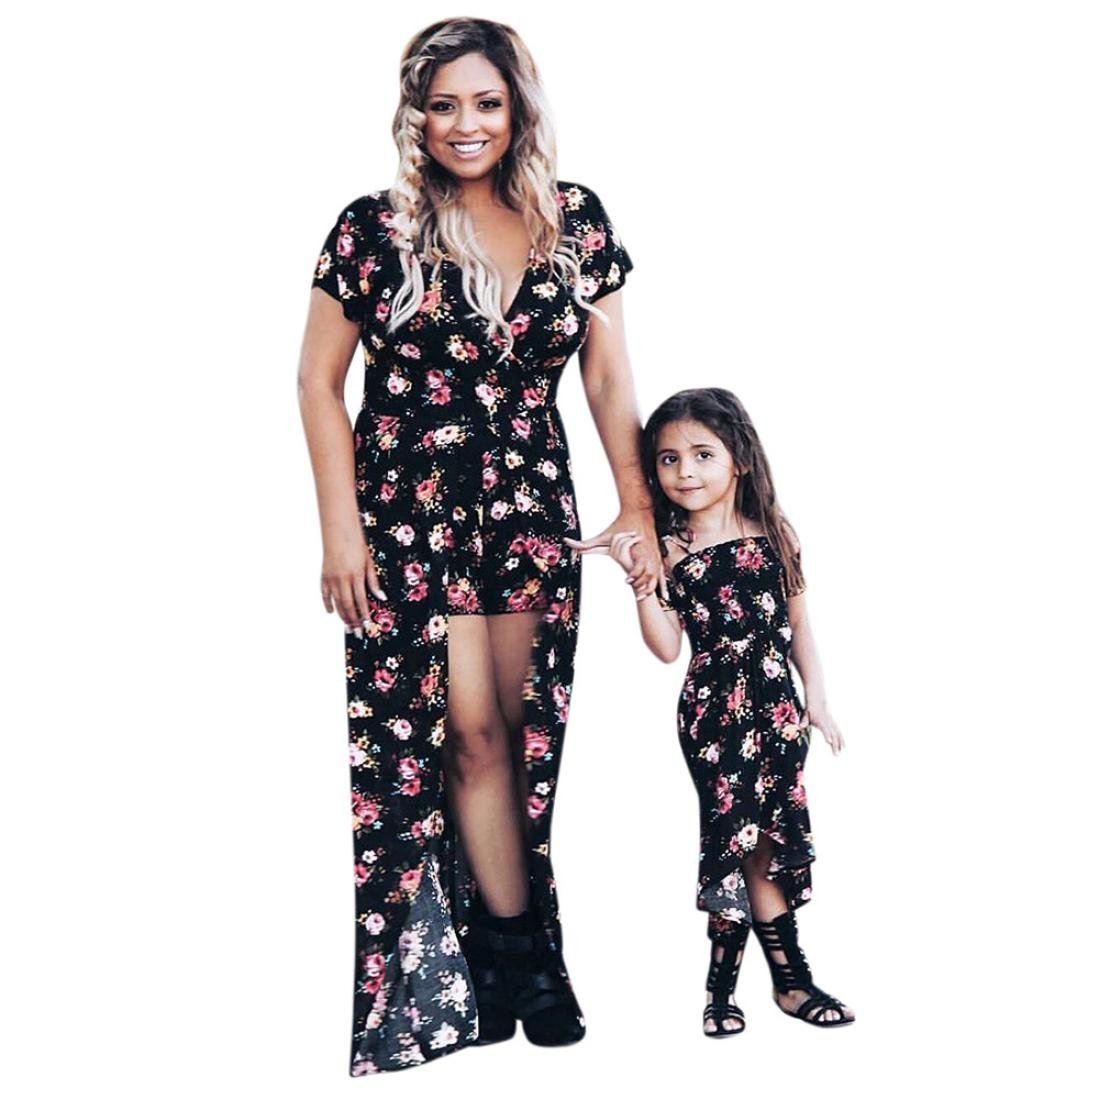 96f4d3d1683f Amazon.com  Hot Sale! Daughter Mom Matching Dresses Floral Split ...